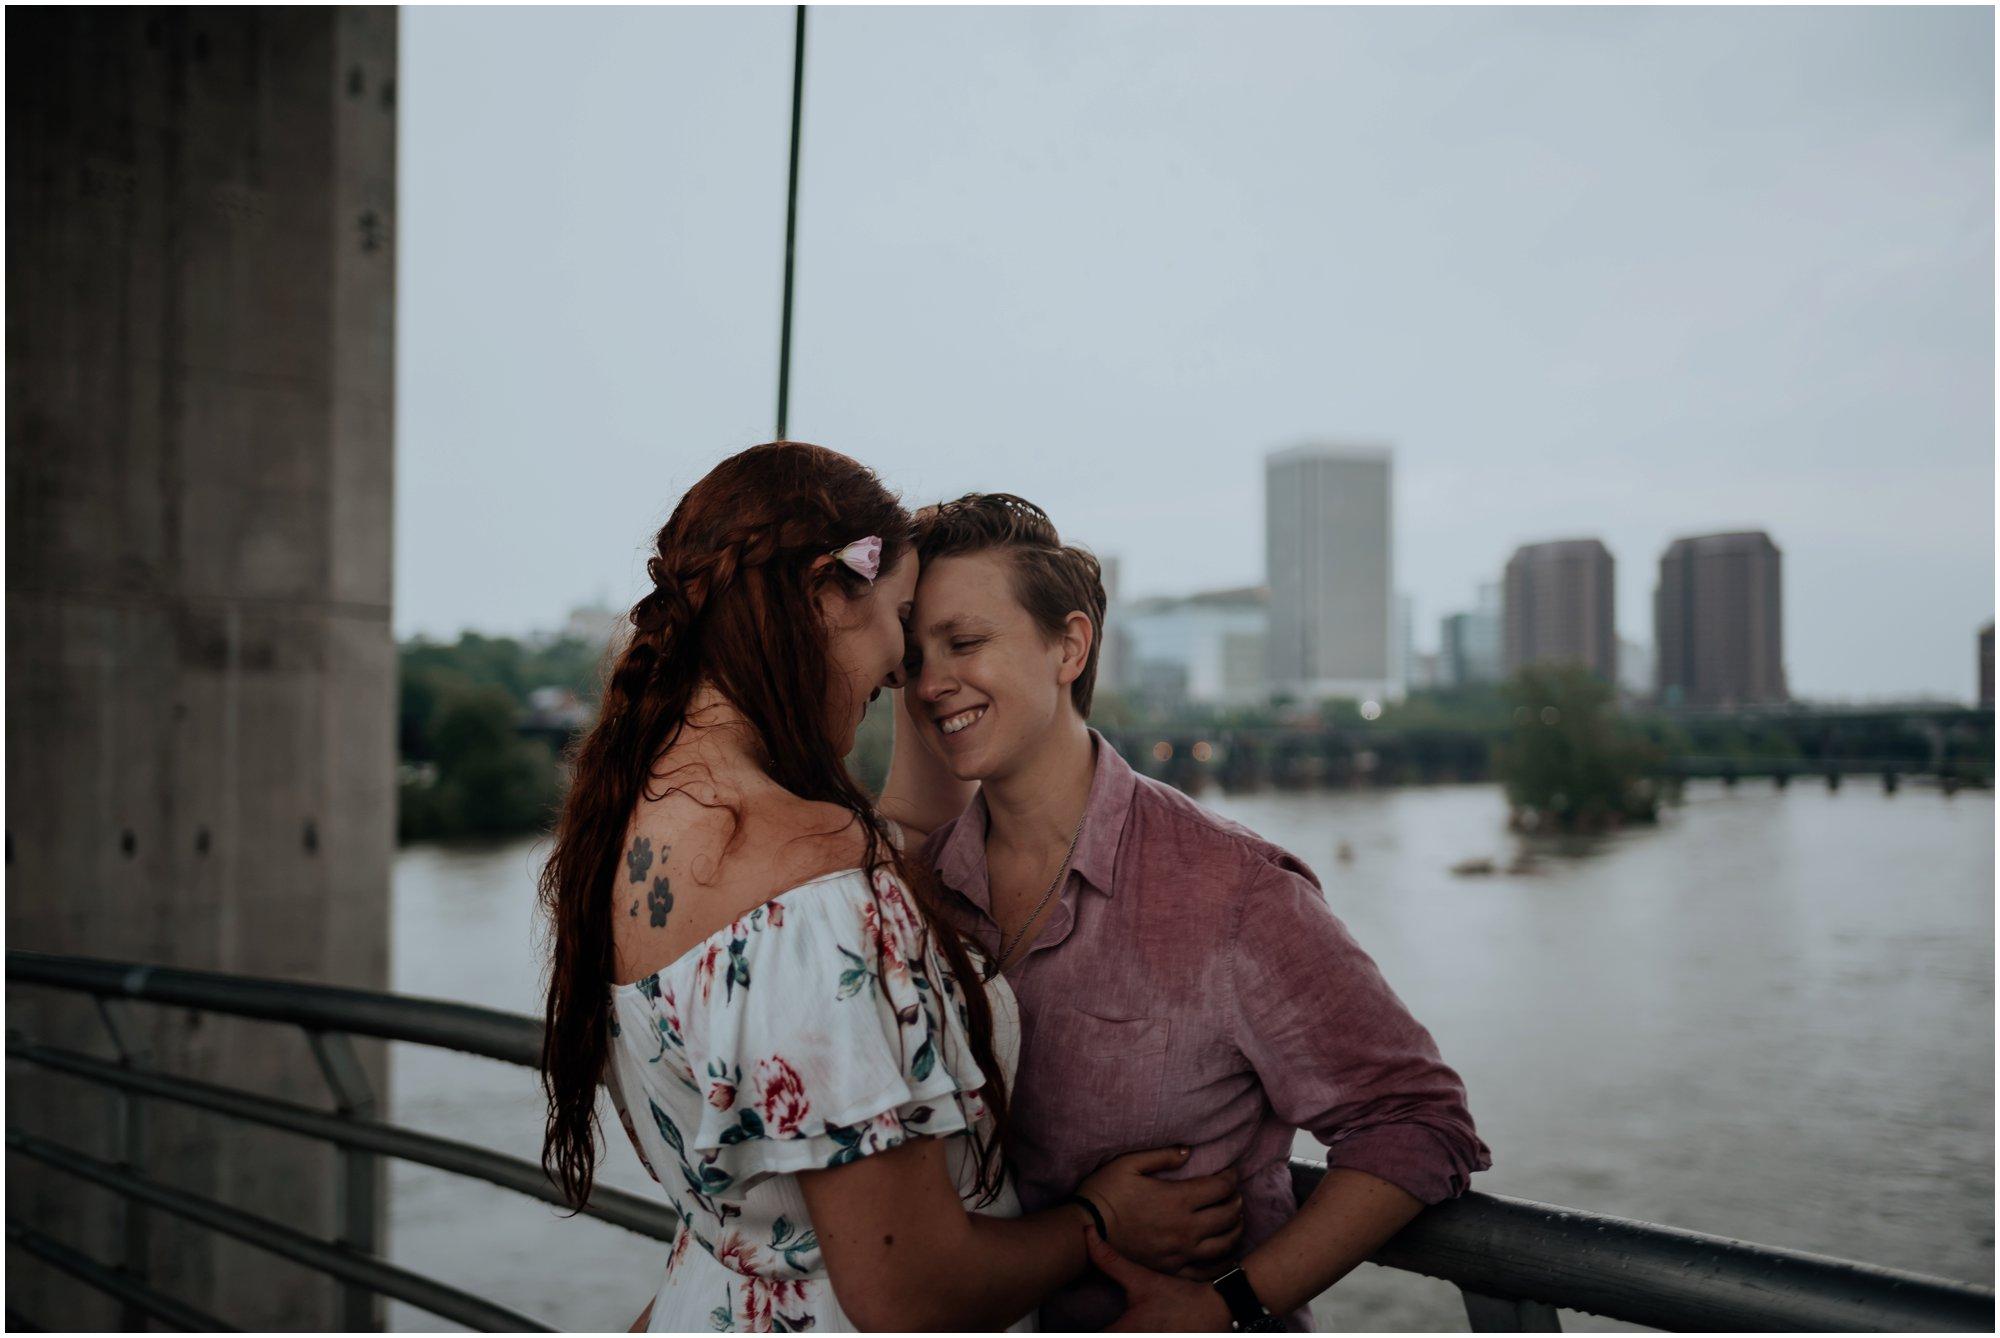 Richmond VA Belle Isle Summer Rainstorm Rainy Gay Lesbian LGBTQ Engagement Photos